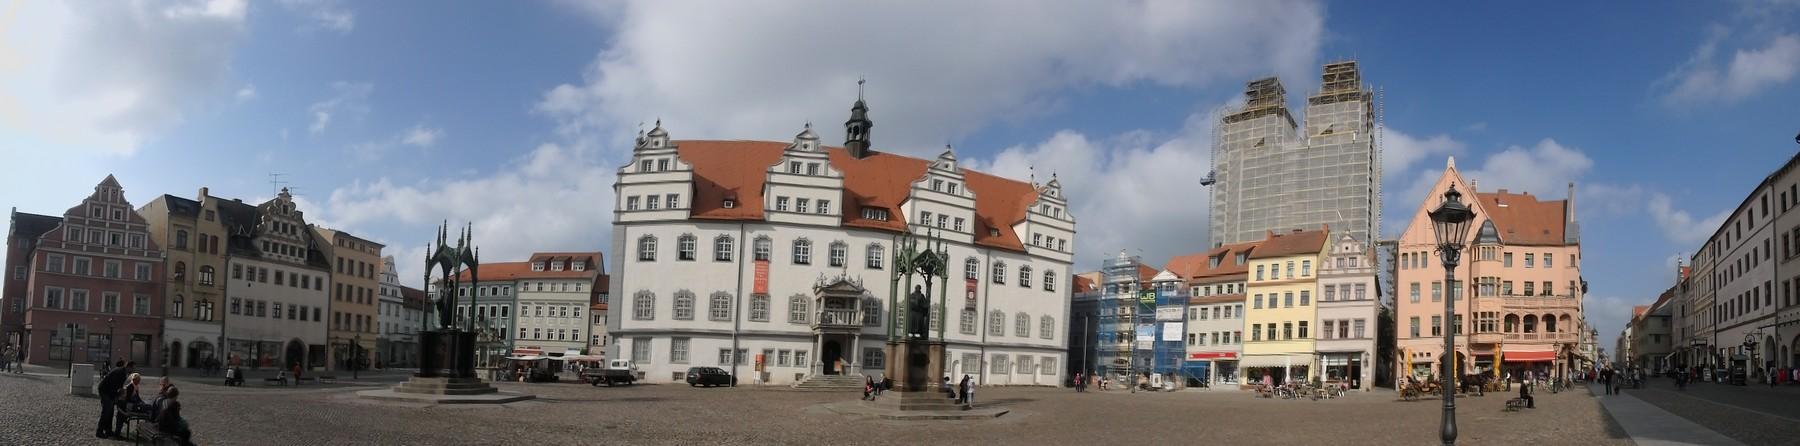 P4240123 Pano Lutero en Wittenberg